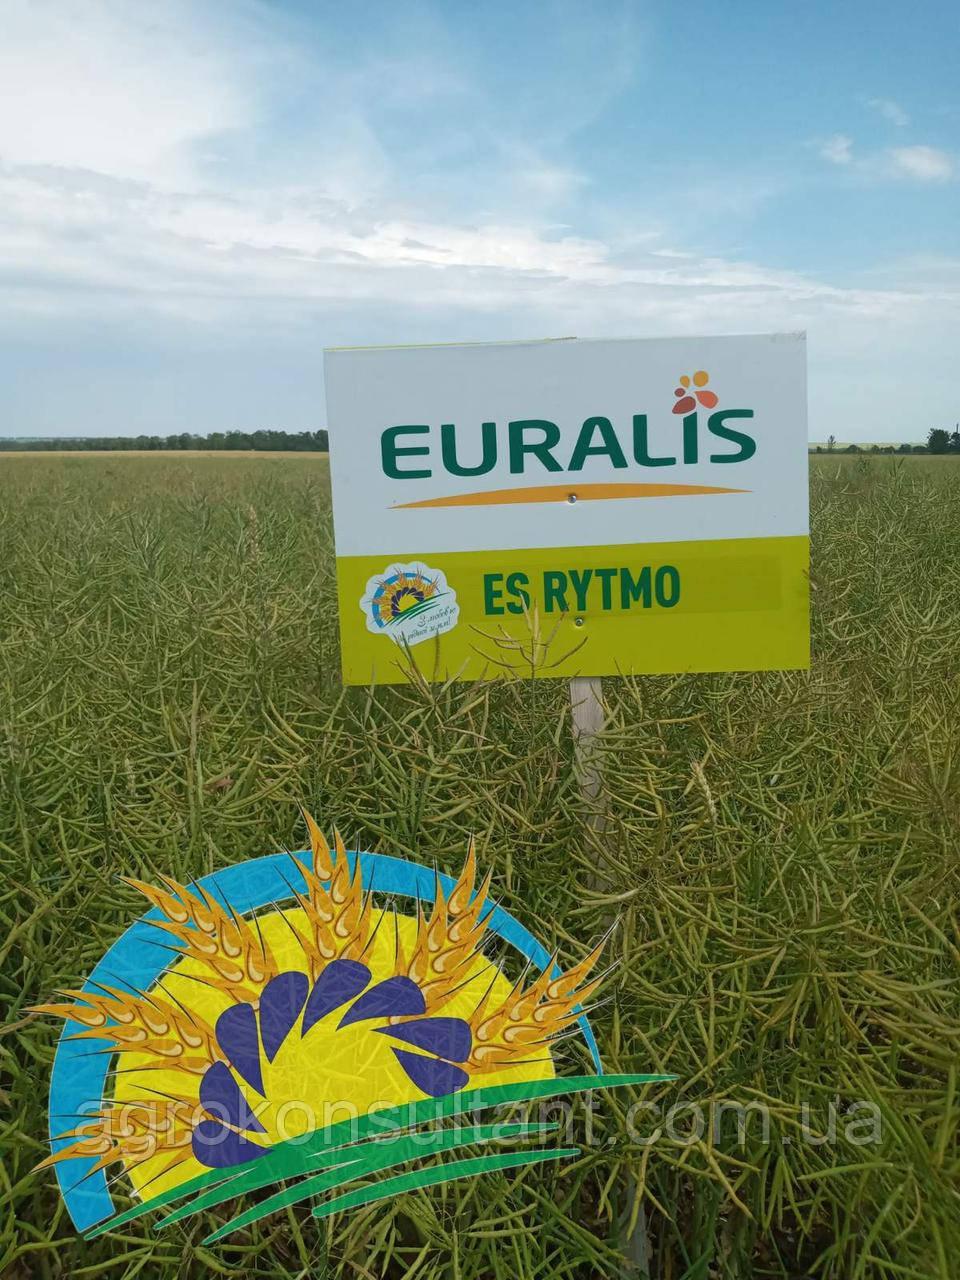 Семена озимого рапса ЕС Ритмо (среднераний гибрид) урожай 2019, Euralis